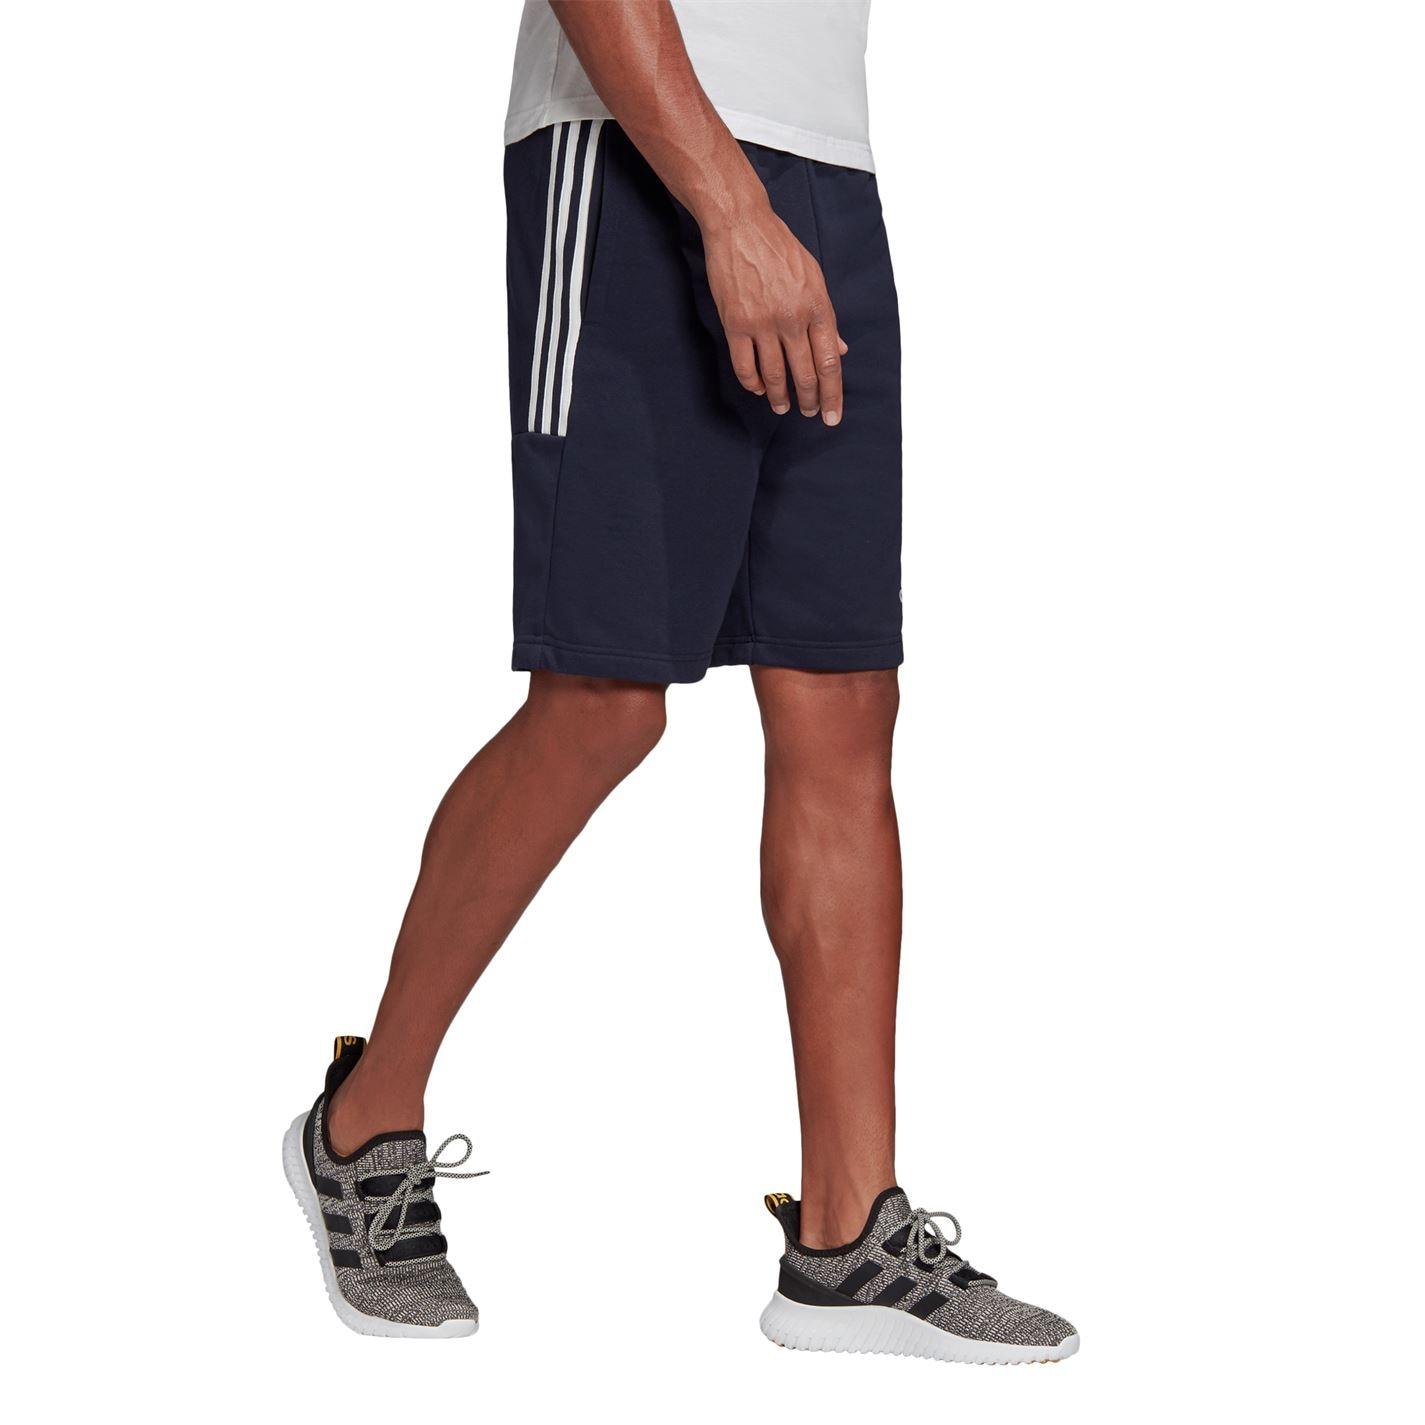 Men's shorts Adidas 3S Jersey